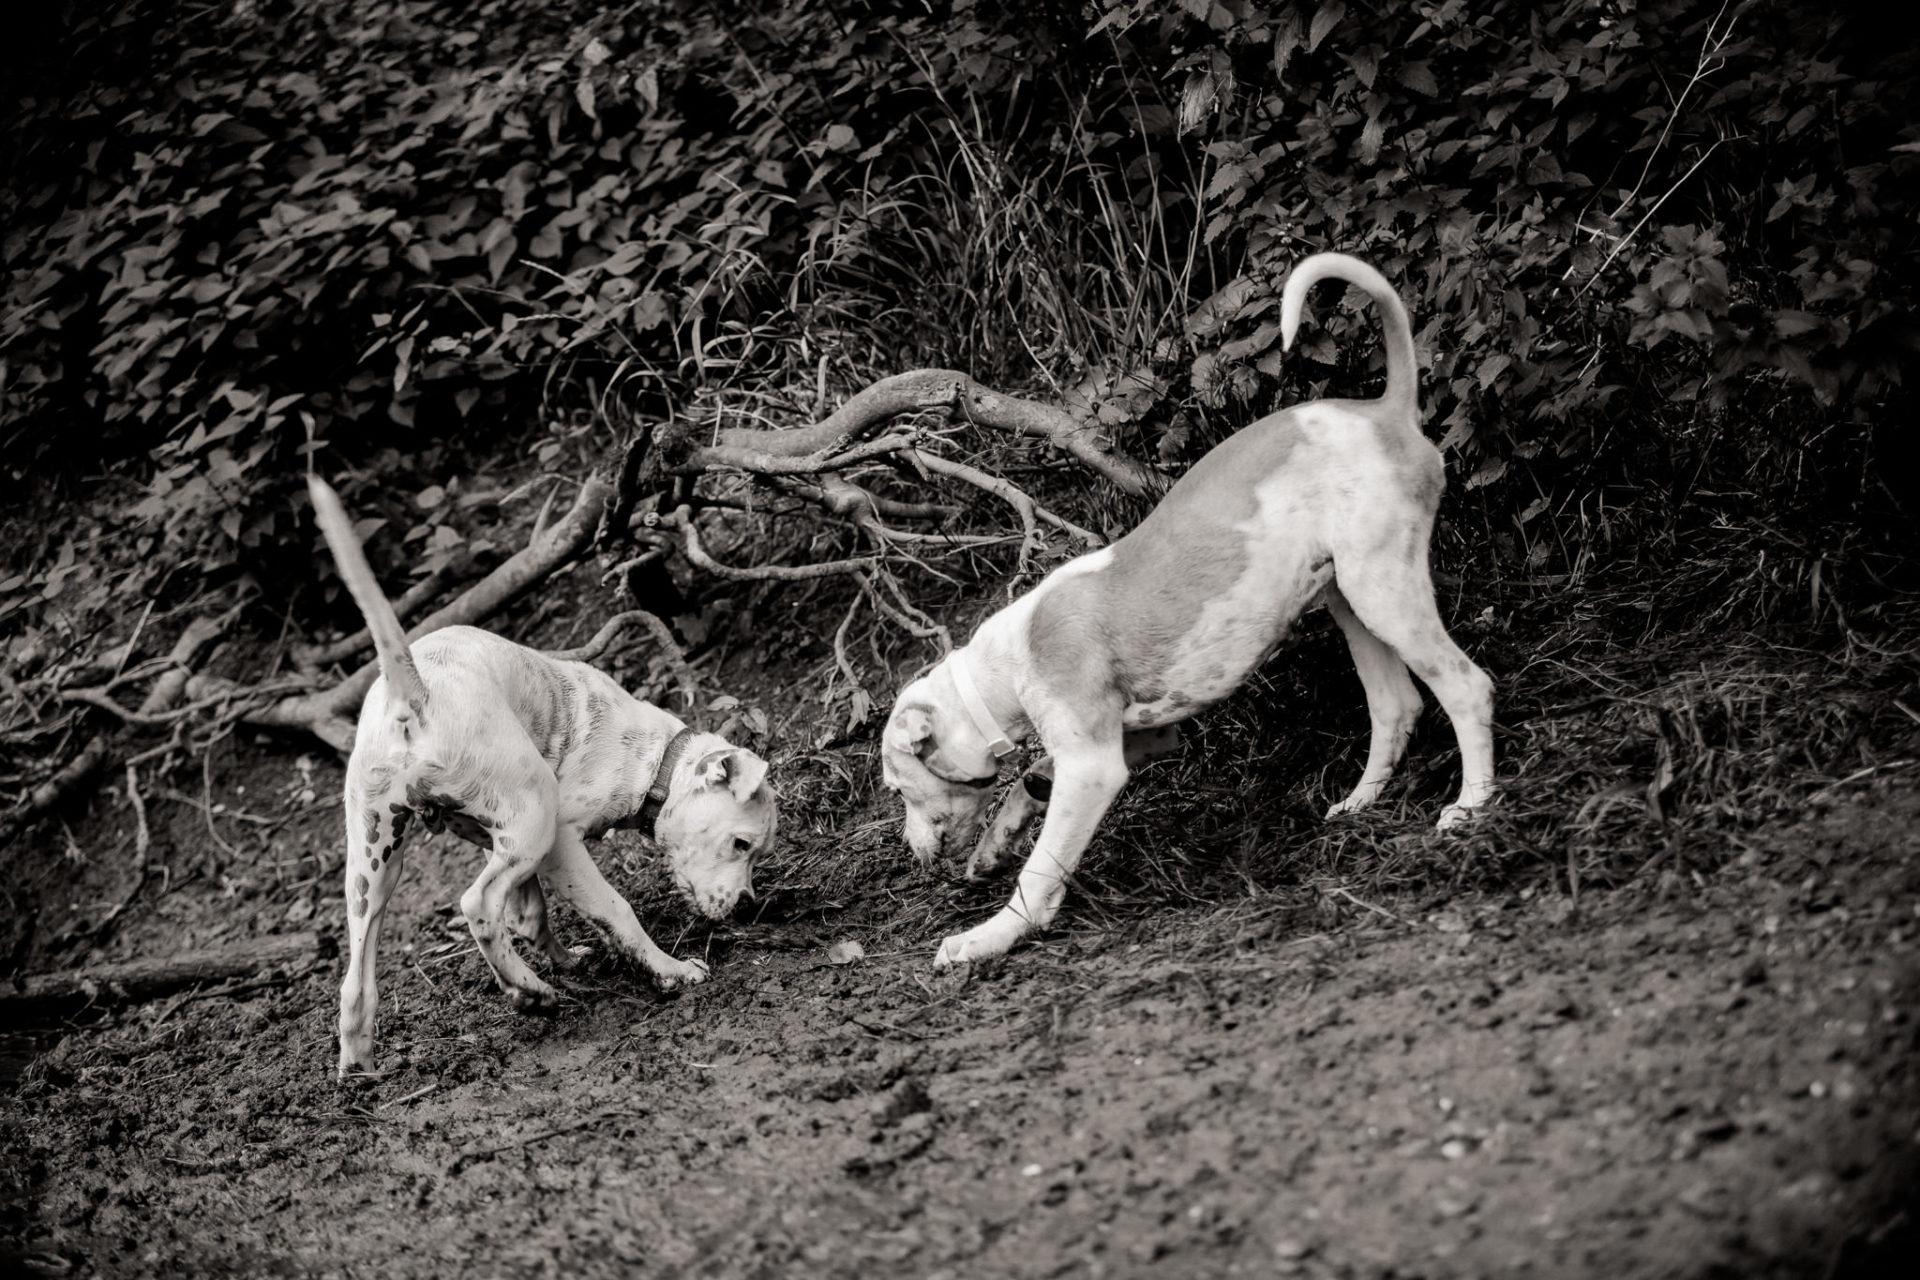 dog photographer stuttgart-pets portraits-natural animal photos-american bulldog puppy-two puppies-playtime